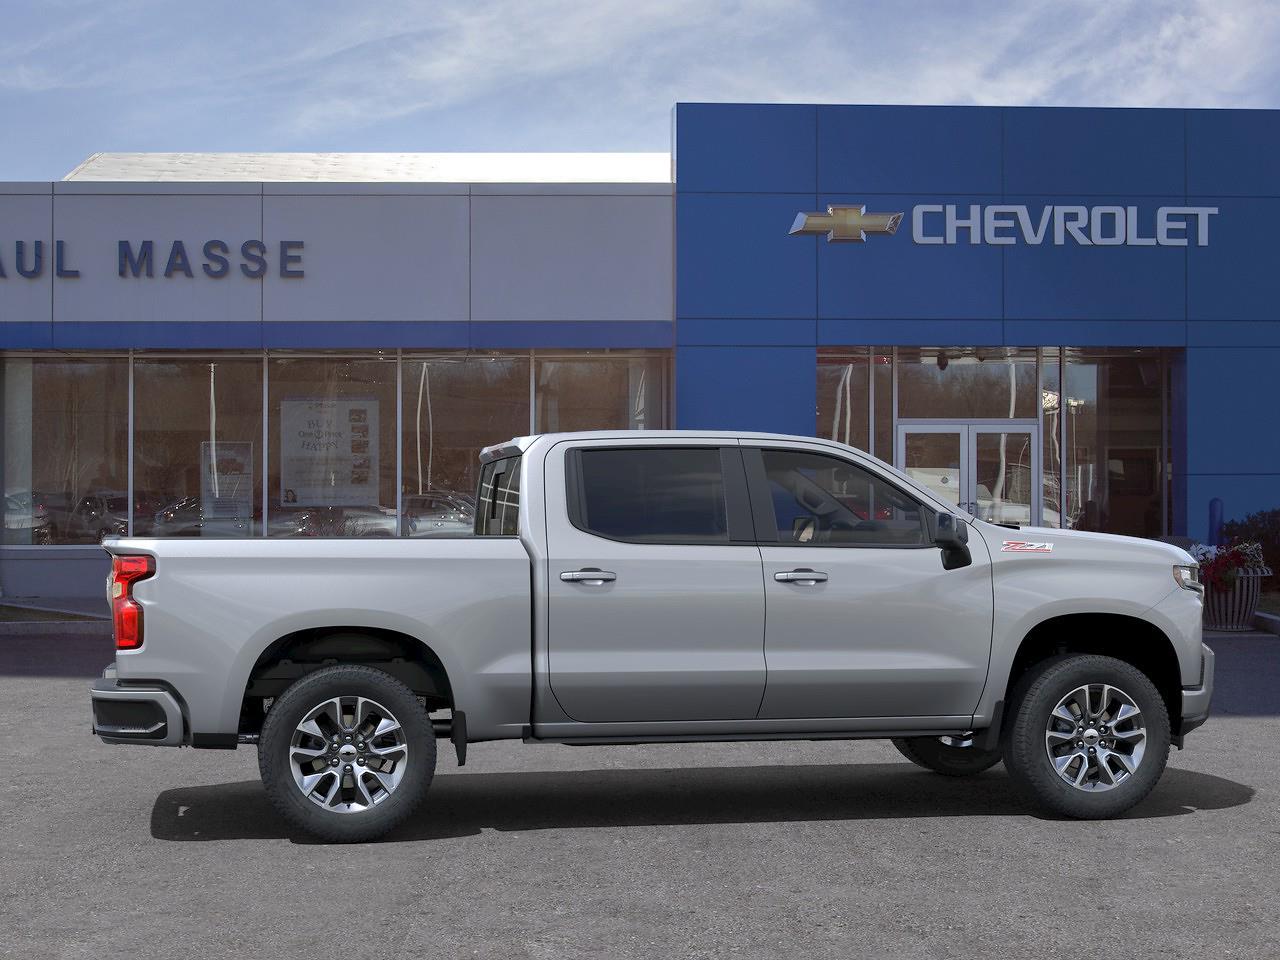 2021 Chevrolet Silverado 1500 Crew Cab 4x4, Pickup #CK1533 - photo 5